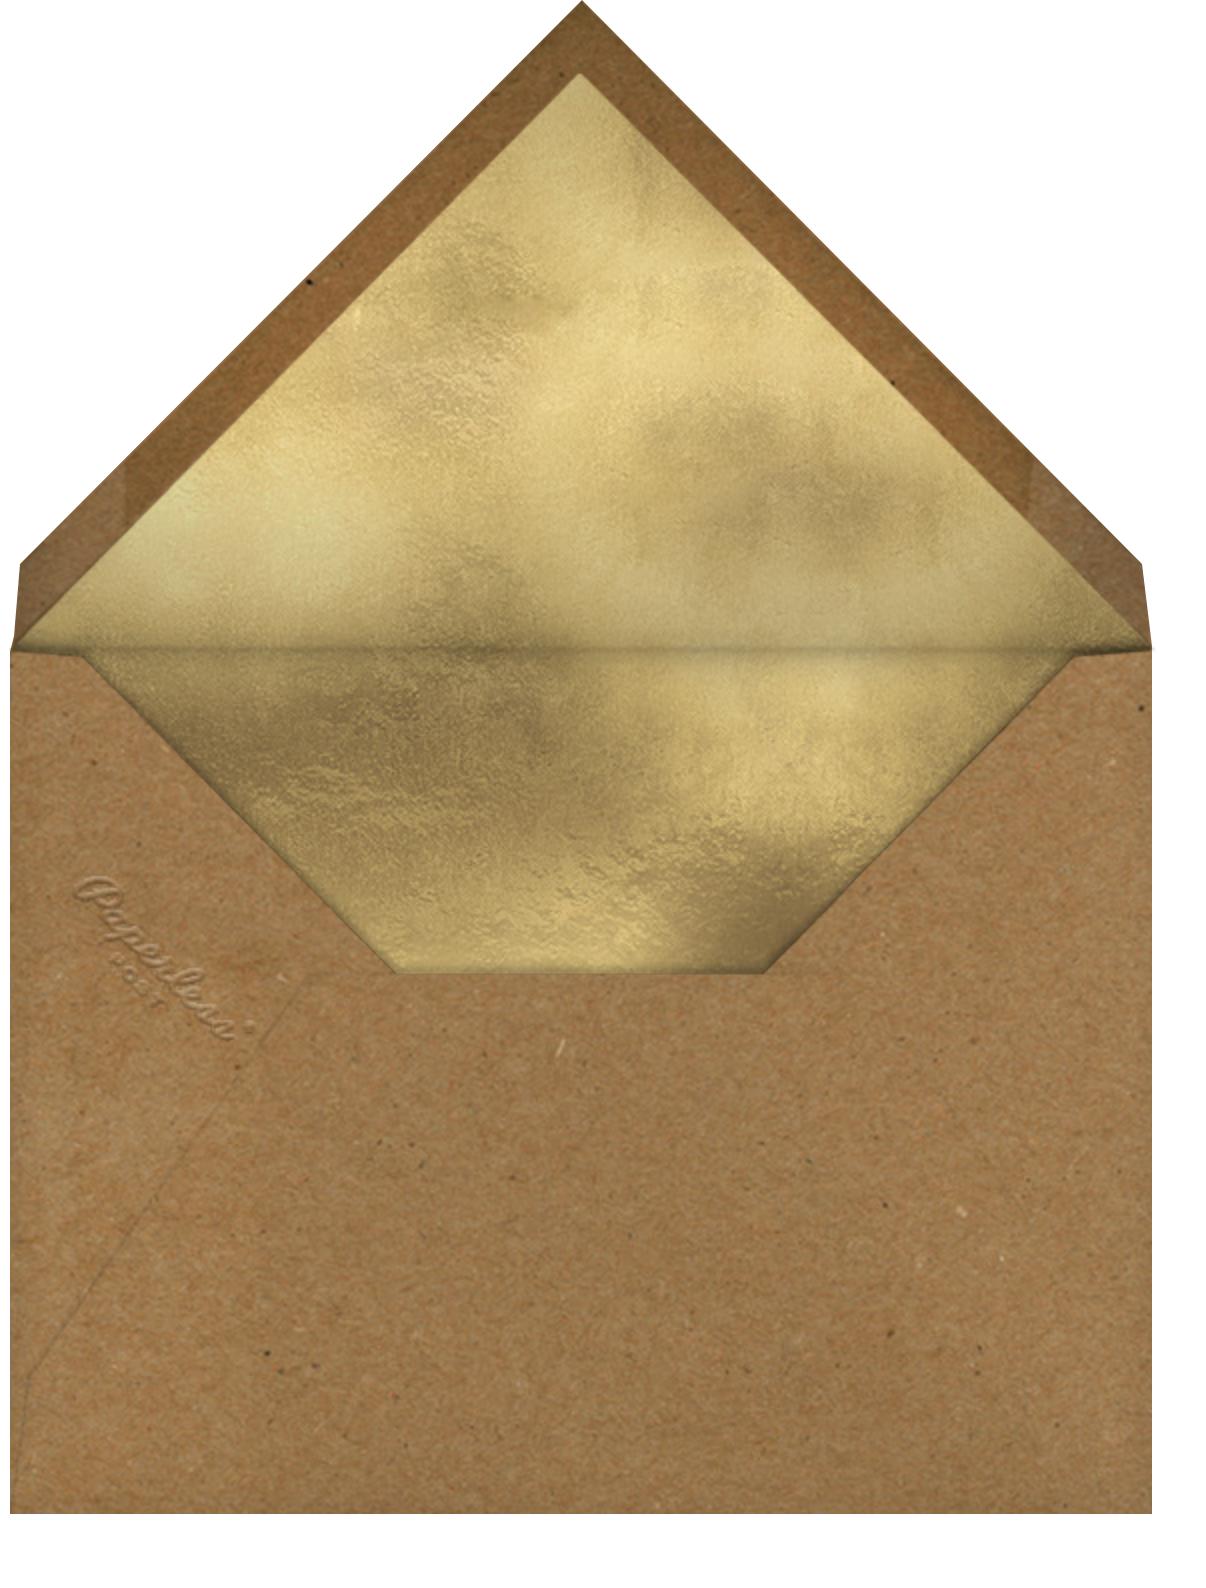 Hotel Udaipur - Cream - Anthropologie - All - envelope back